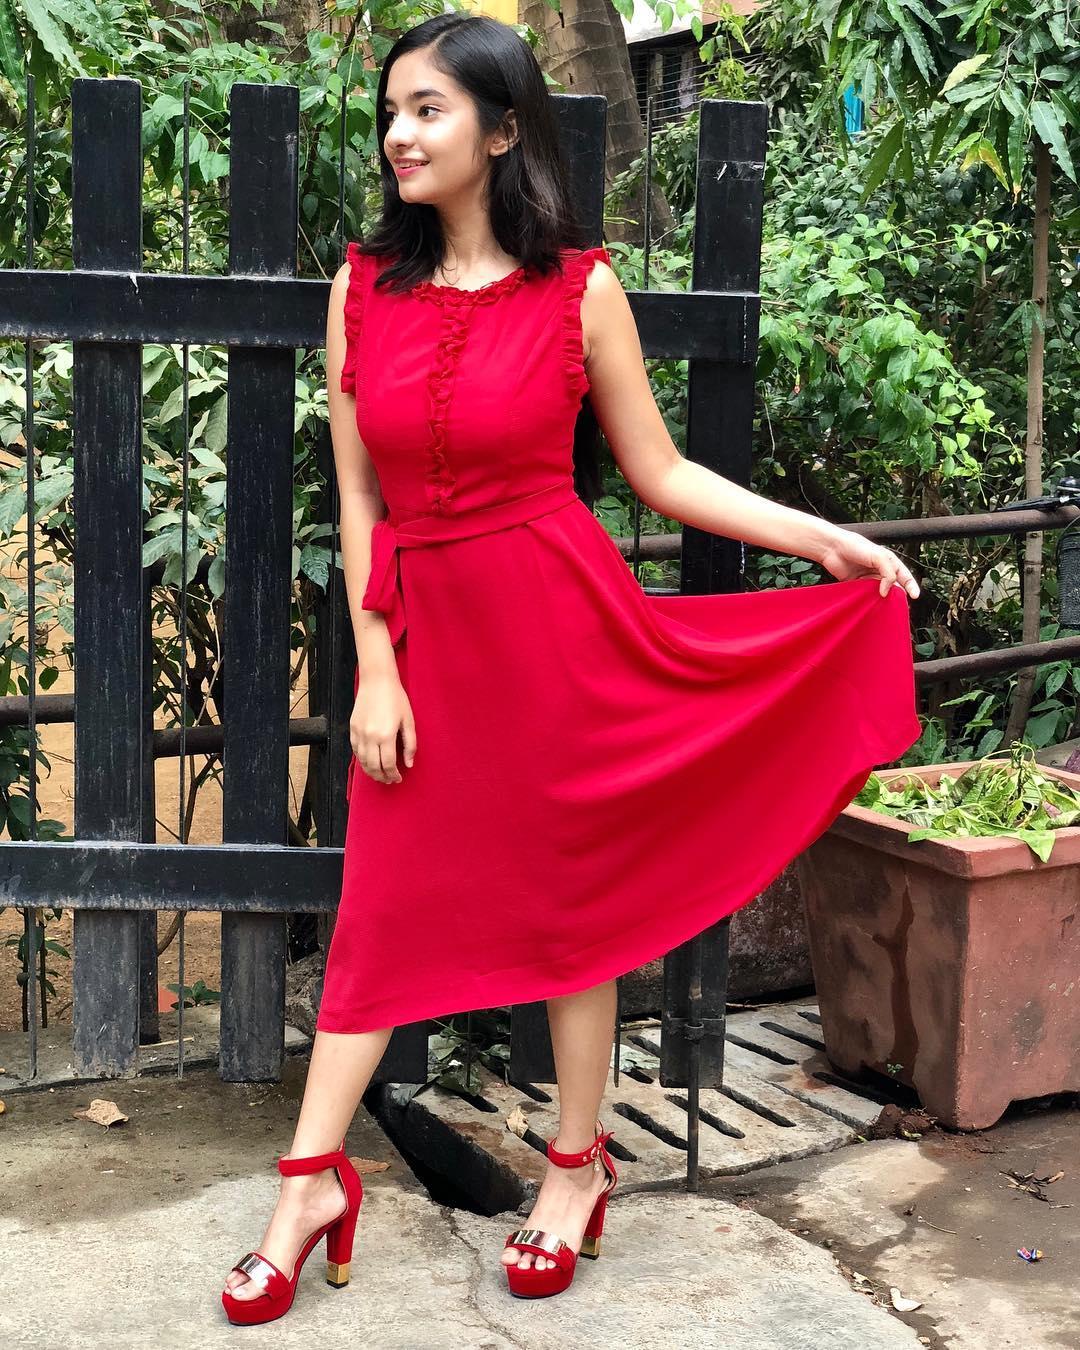 Anushka Sen Hd Photos, Wallpaper, Videos And Gallery 2019 - The News And Masti-8641